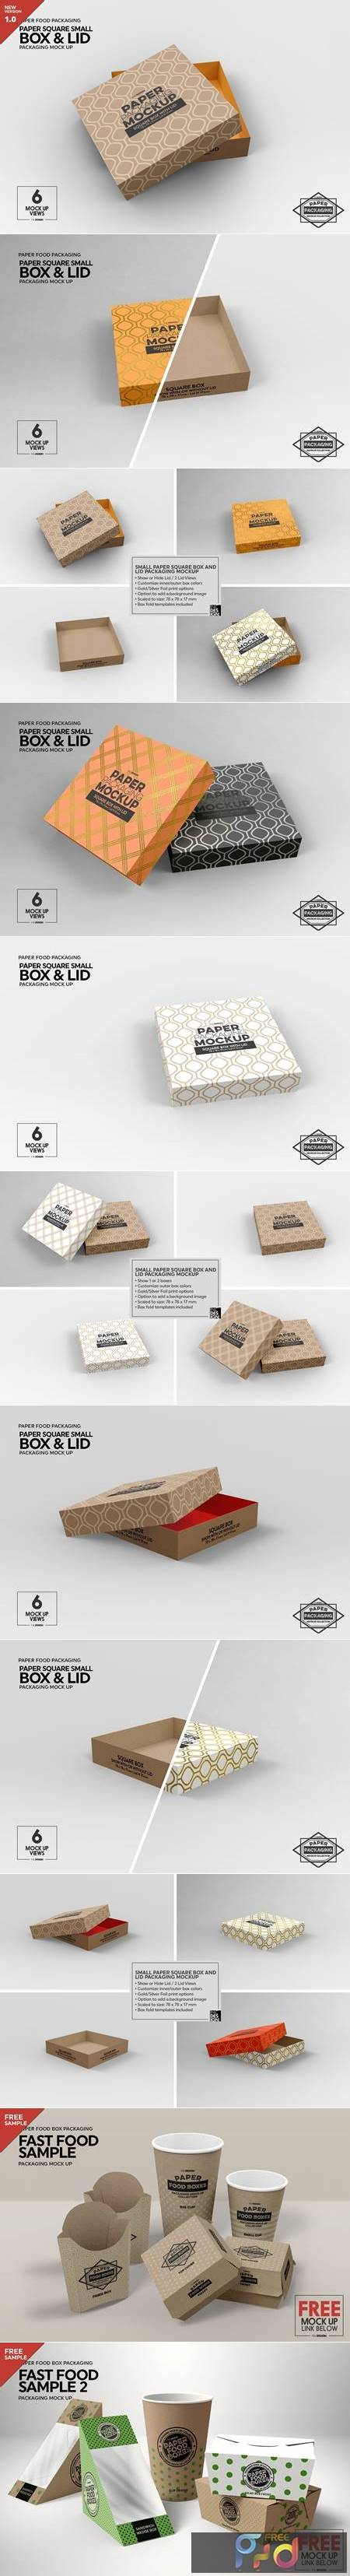 Small Square Paper Box&Lid Mockup 4824442 1